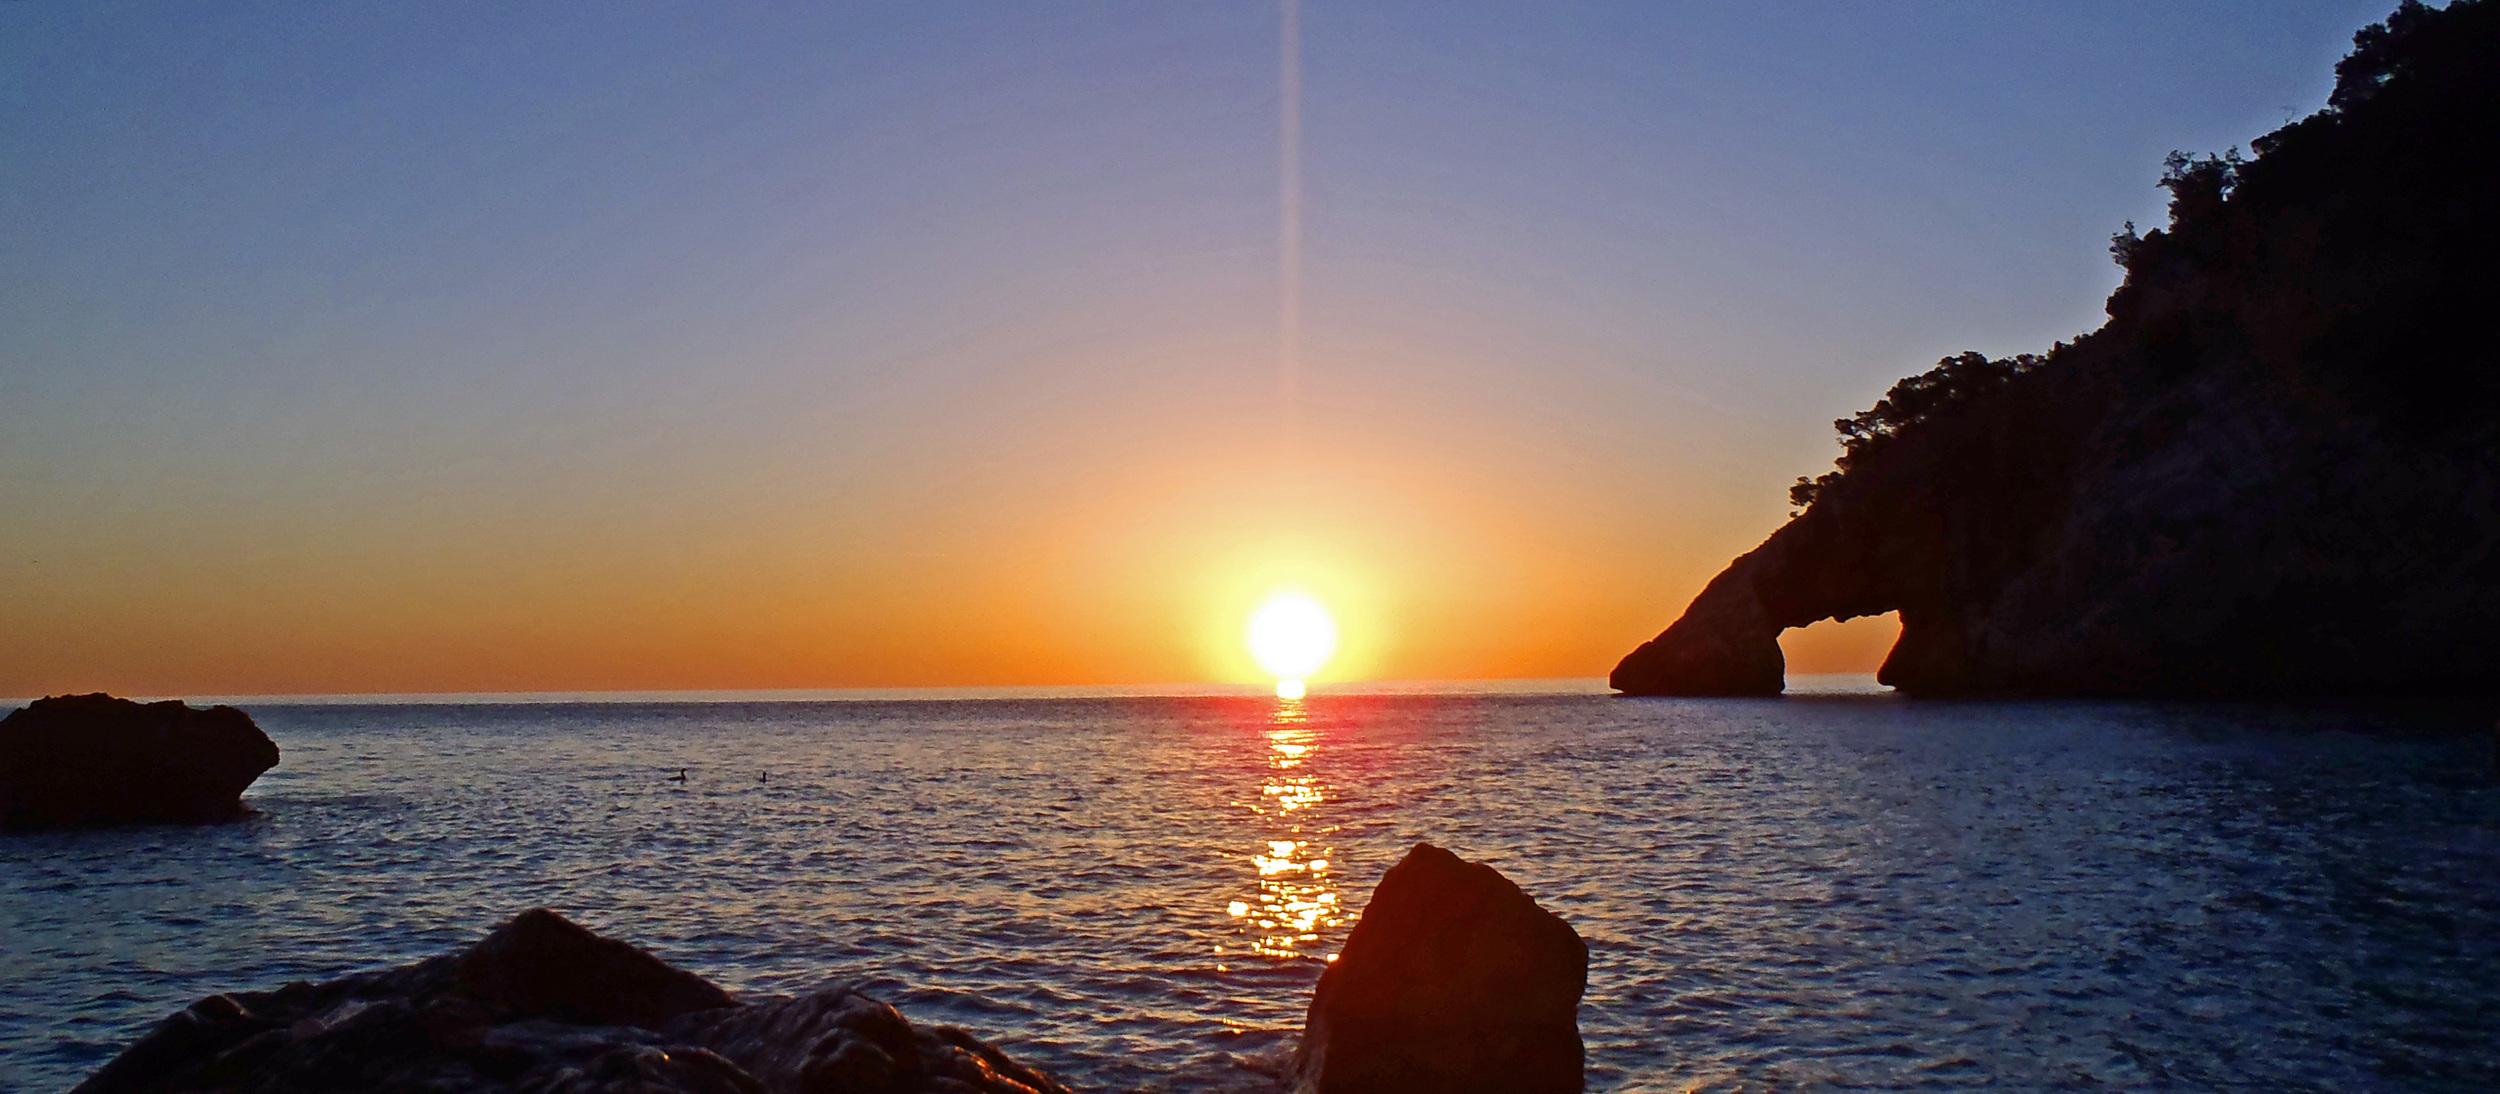 Sunrise at Cala Goloritzè